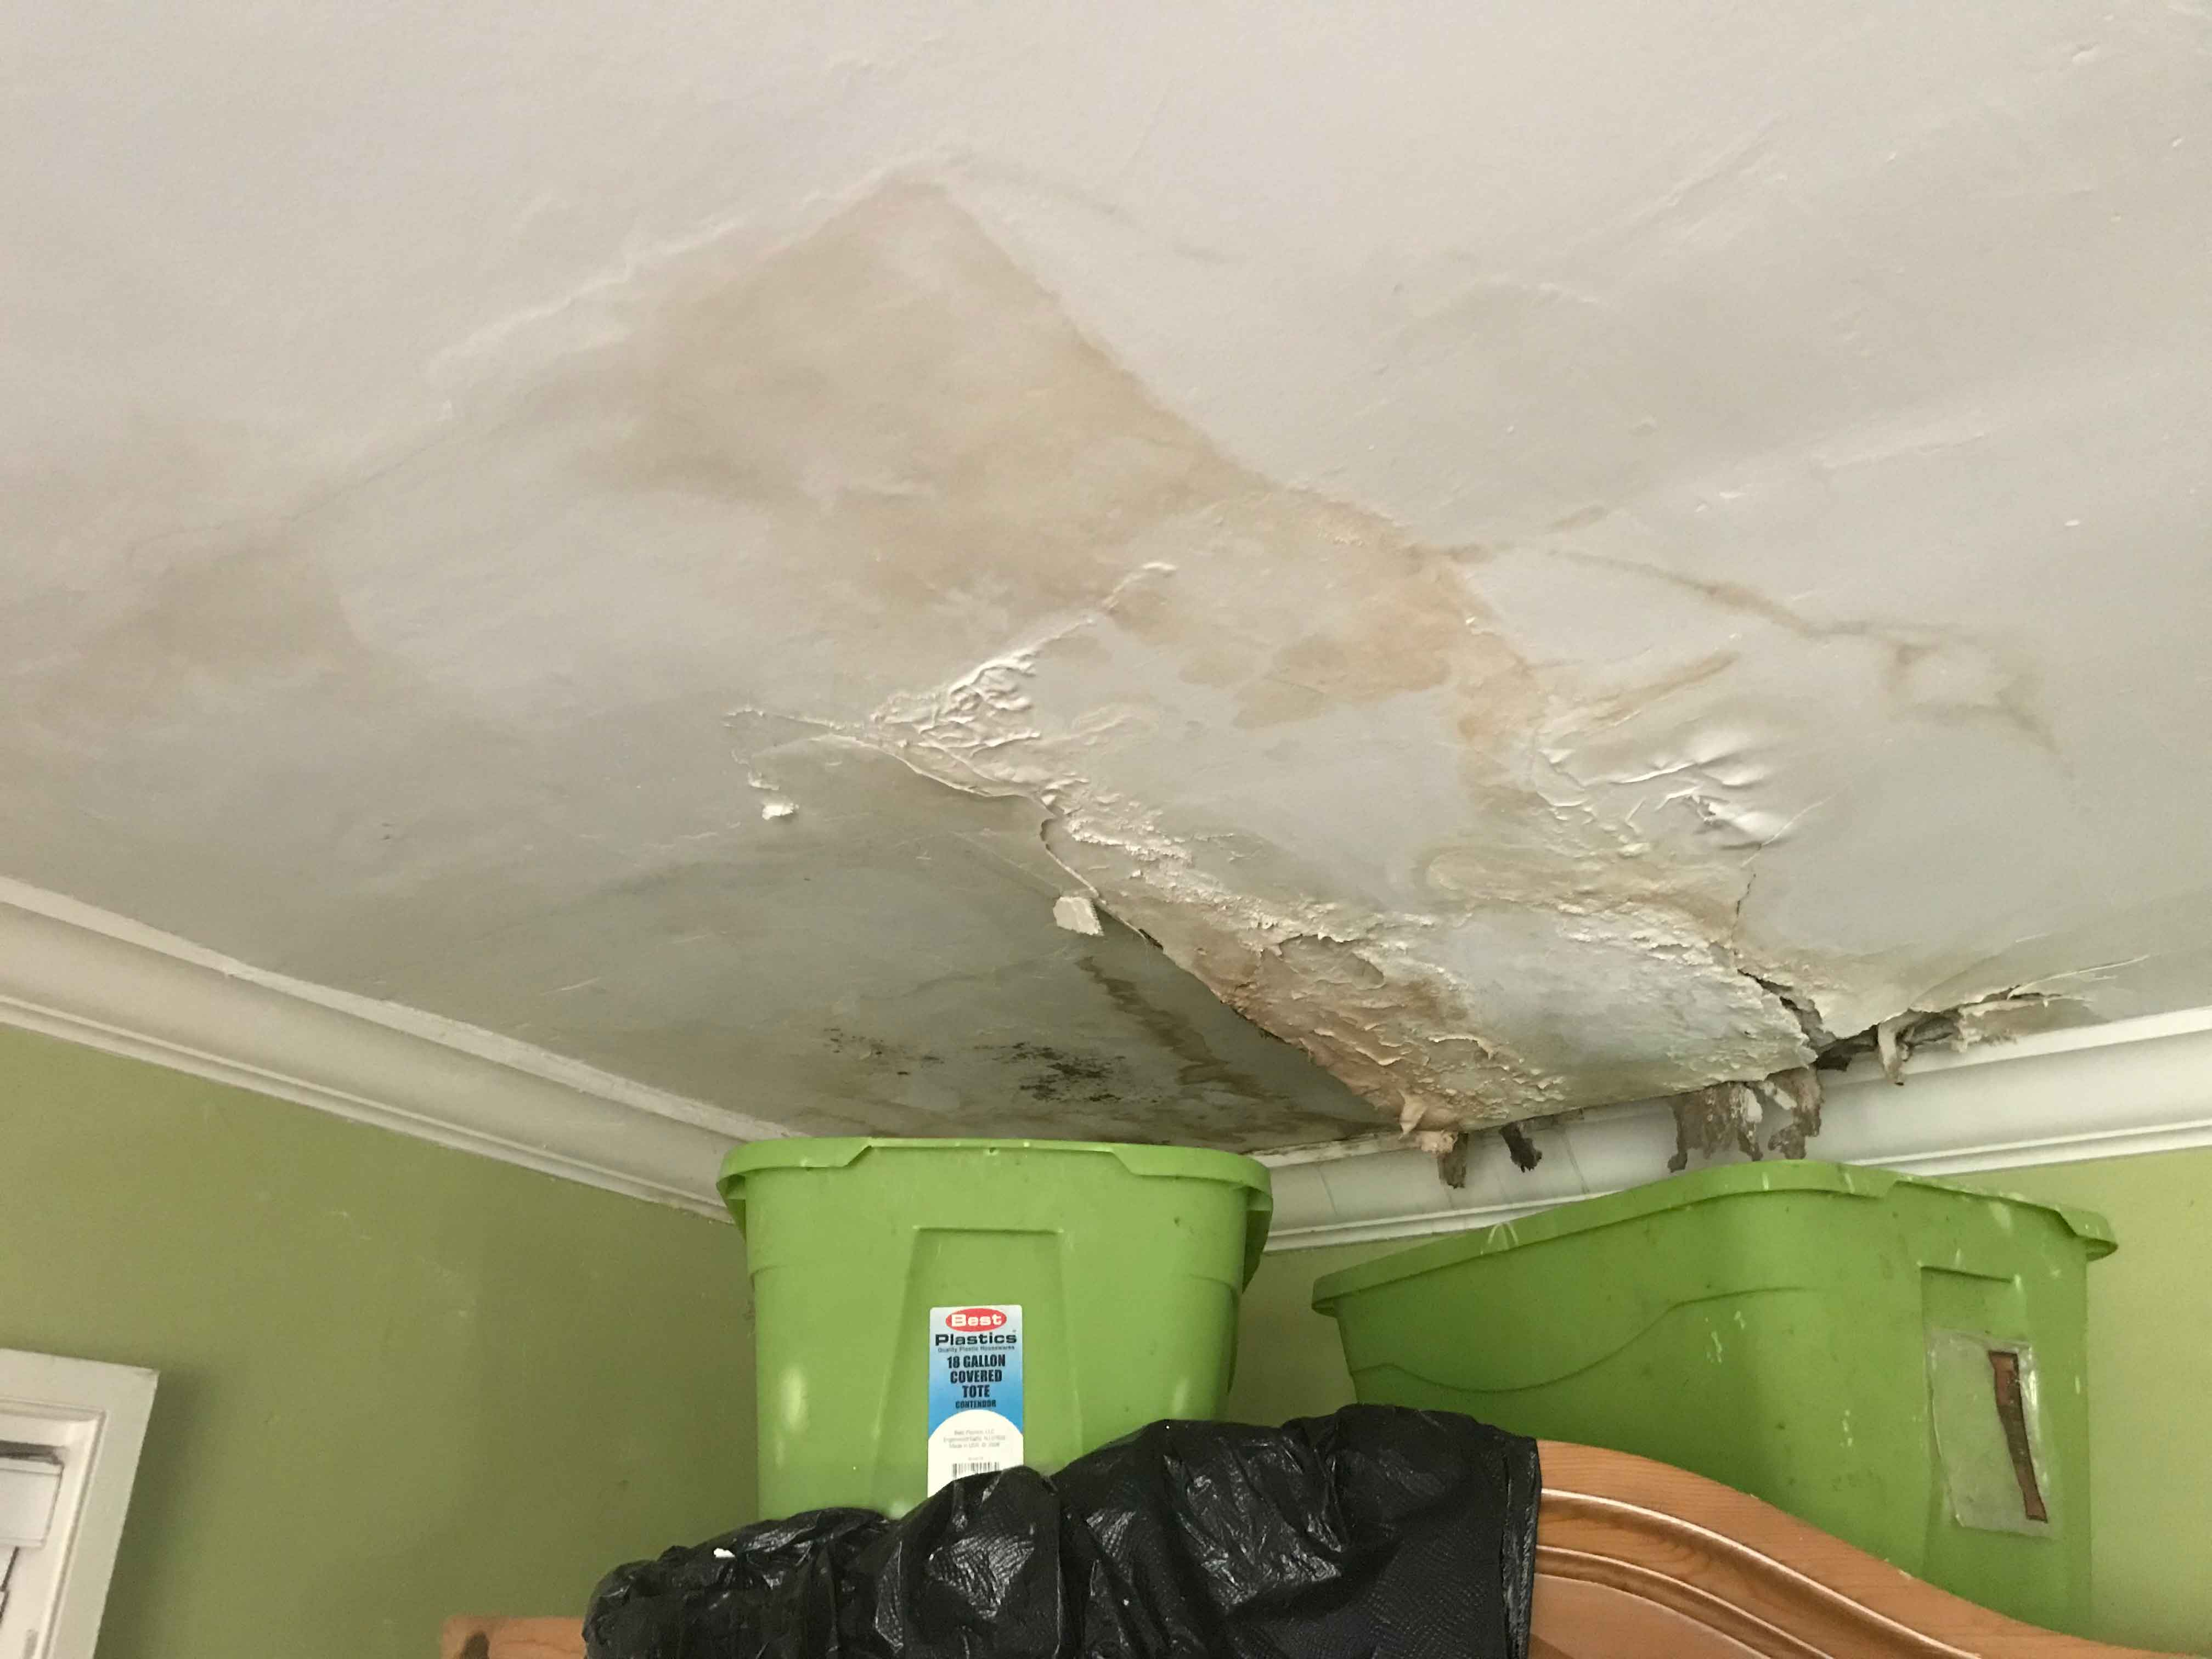 Reel-Contractors-Roof-Water-Damage-Professionals-Company-Pembroke-Pines-Fl